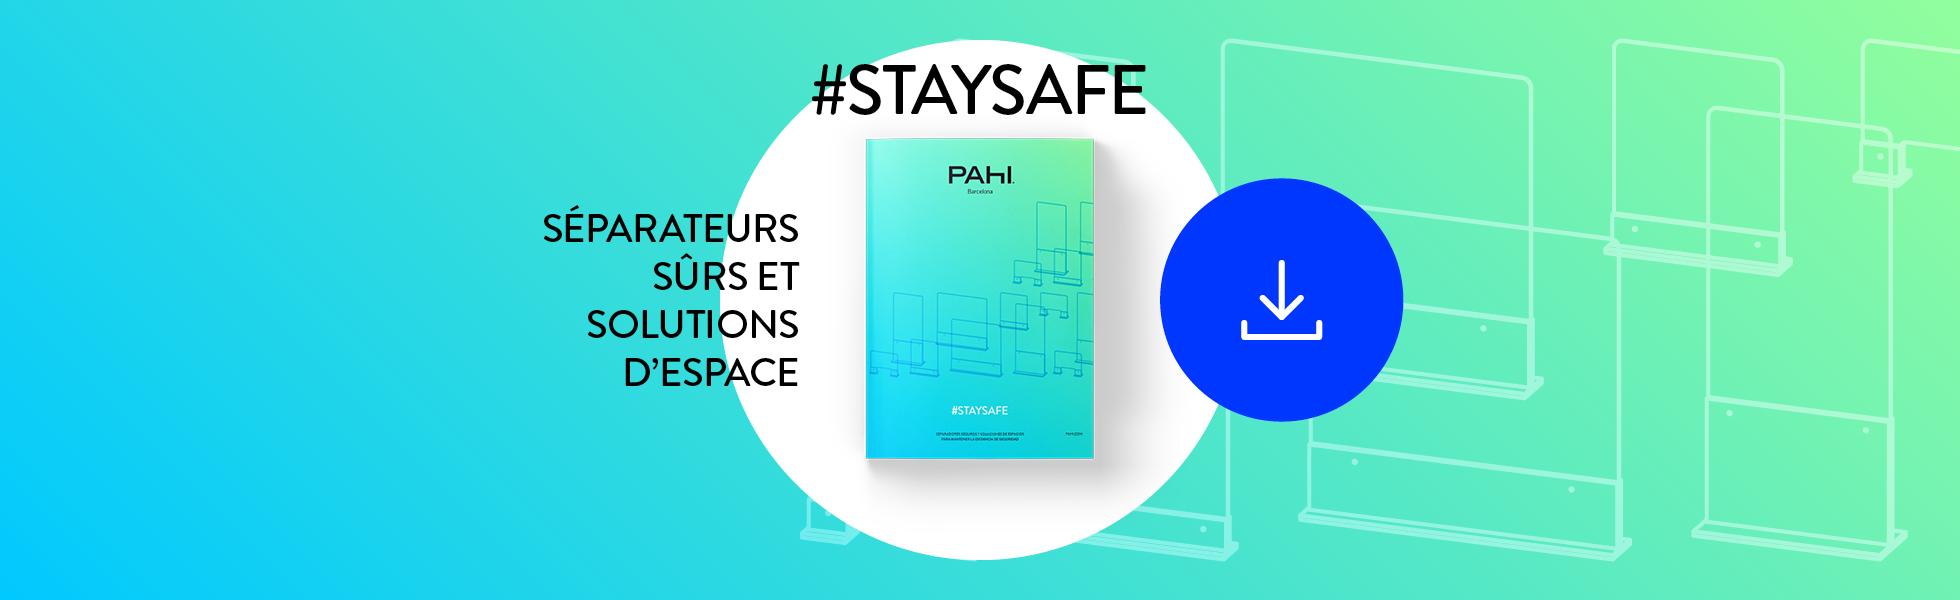 Pahi Stay Safe